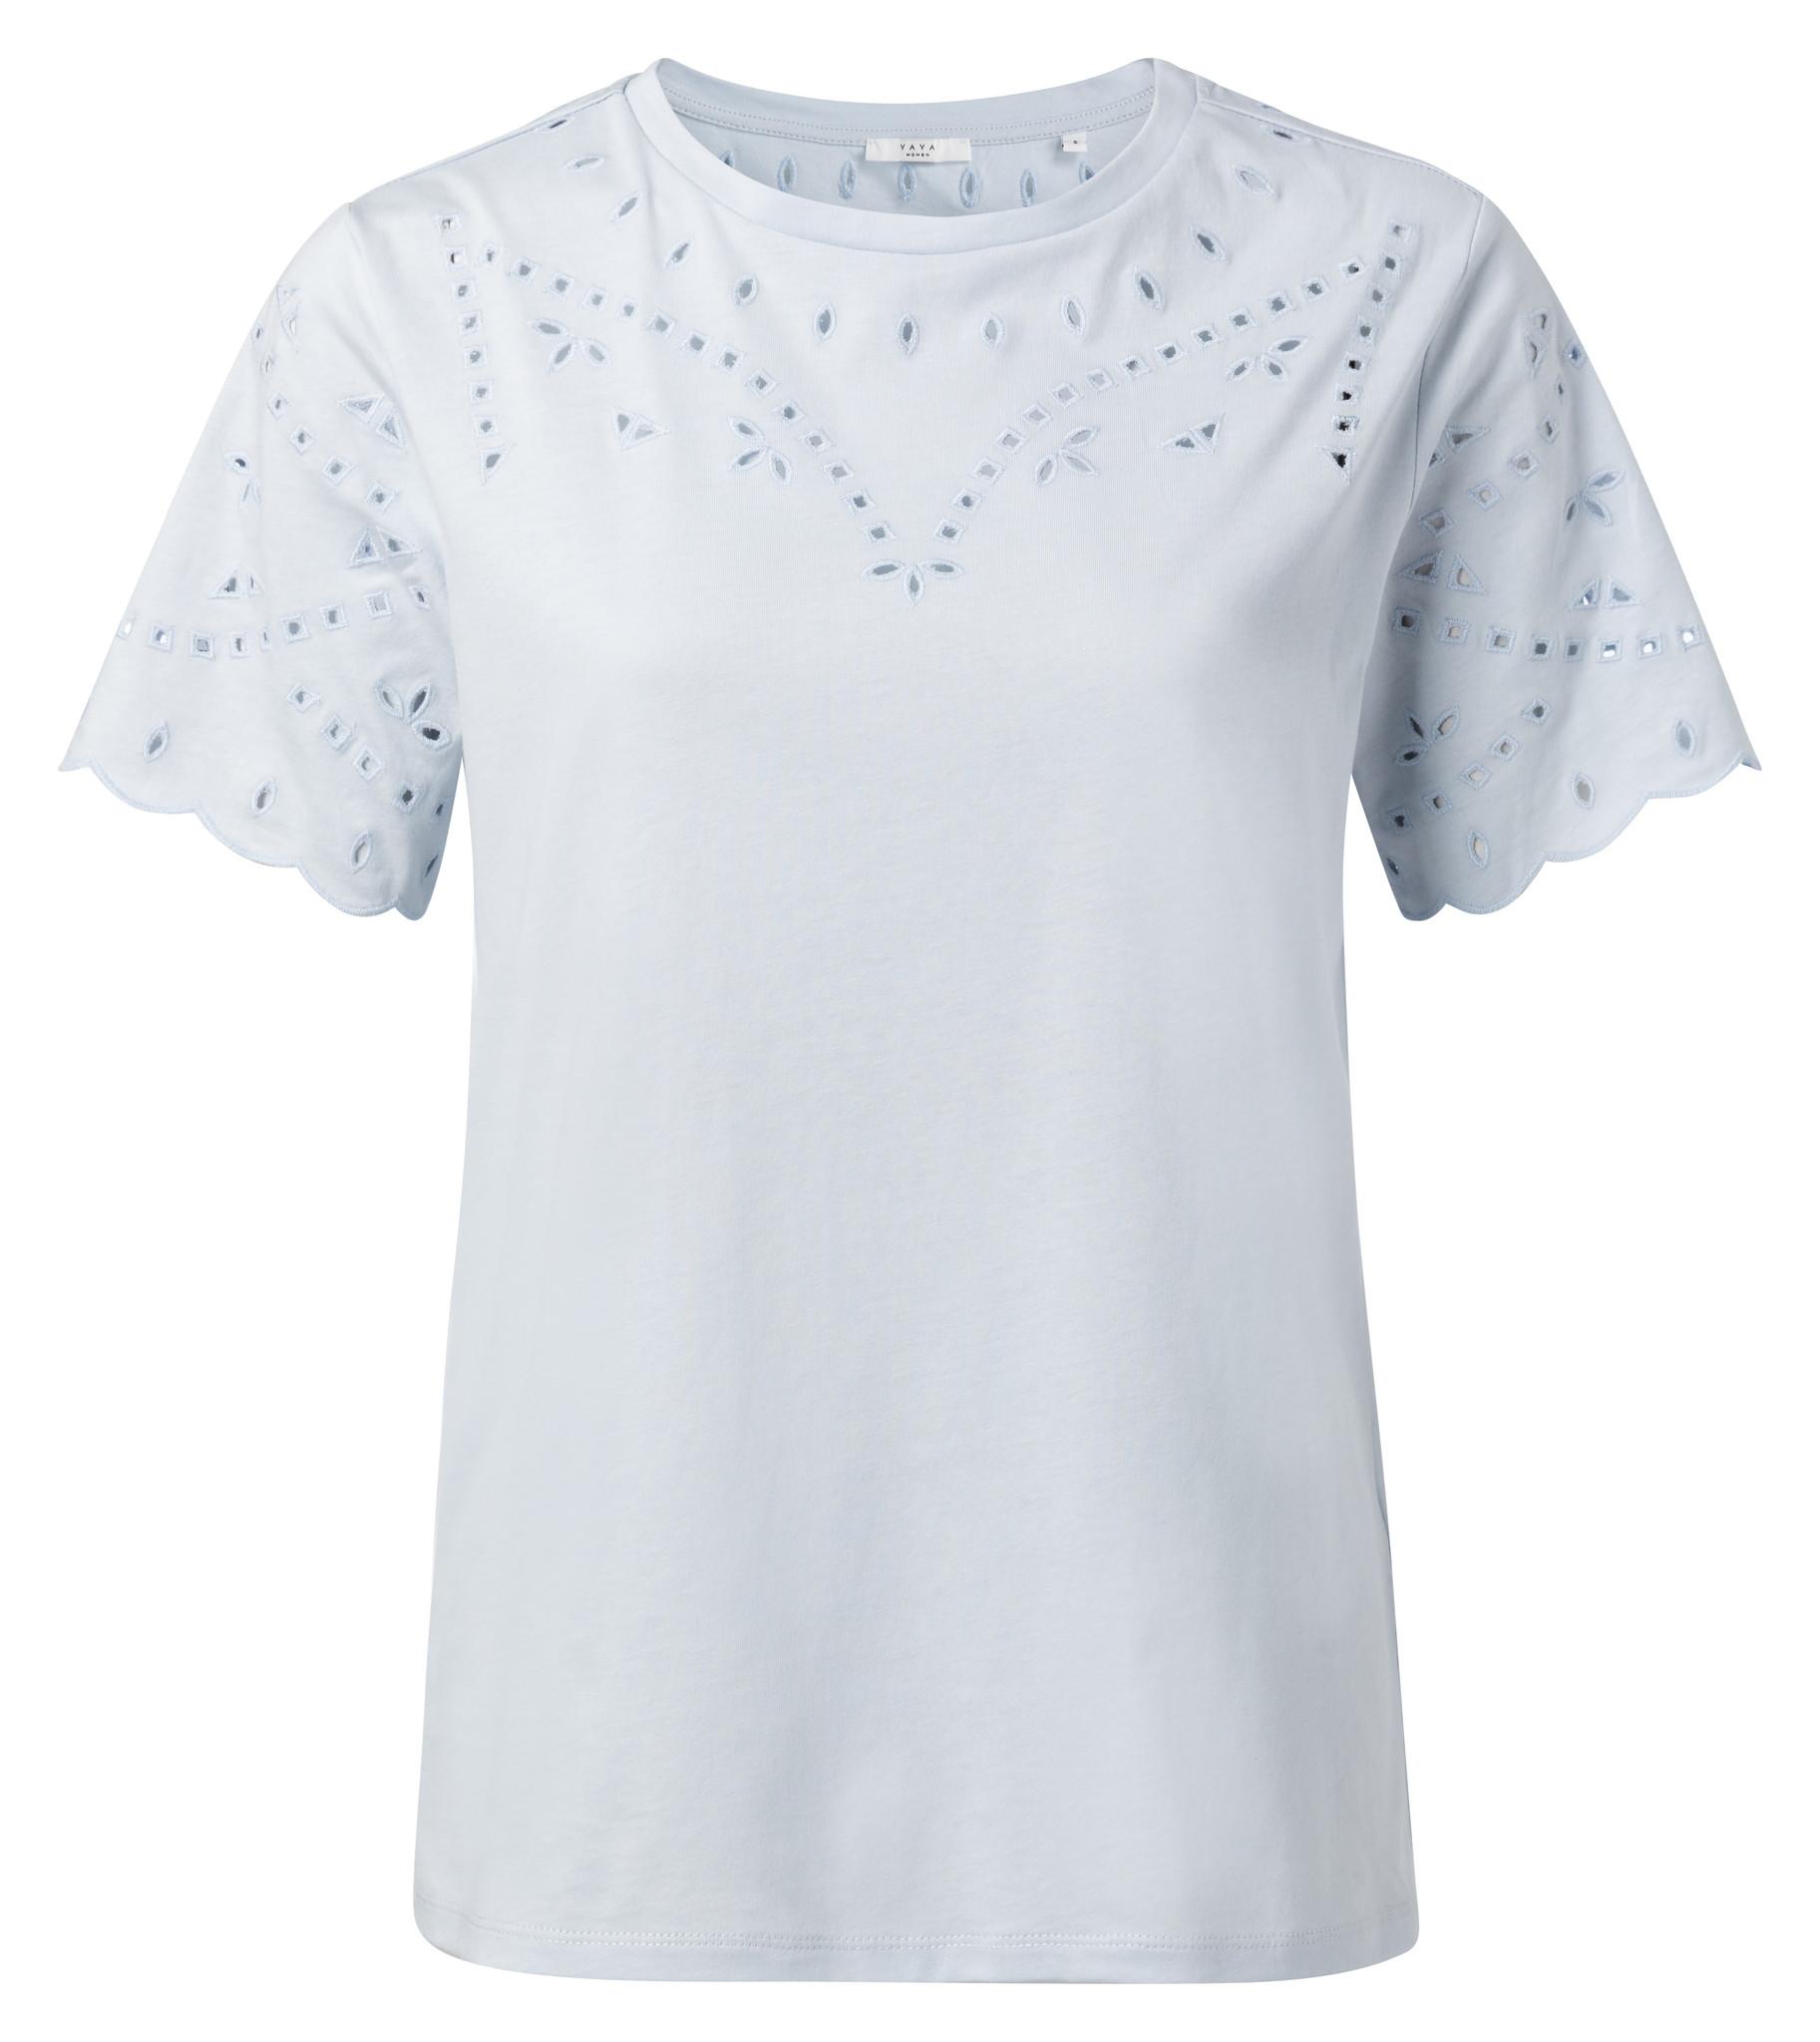 yaya T-shirt with broderi 1919136-014-1